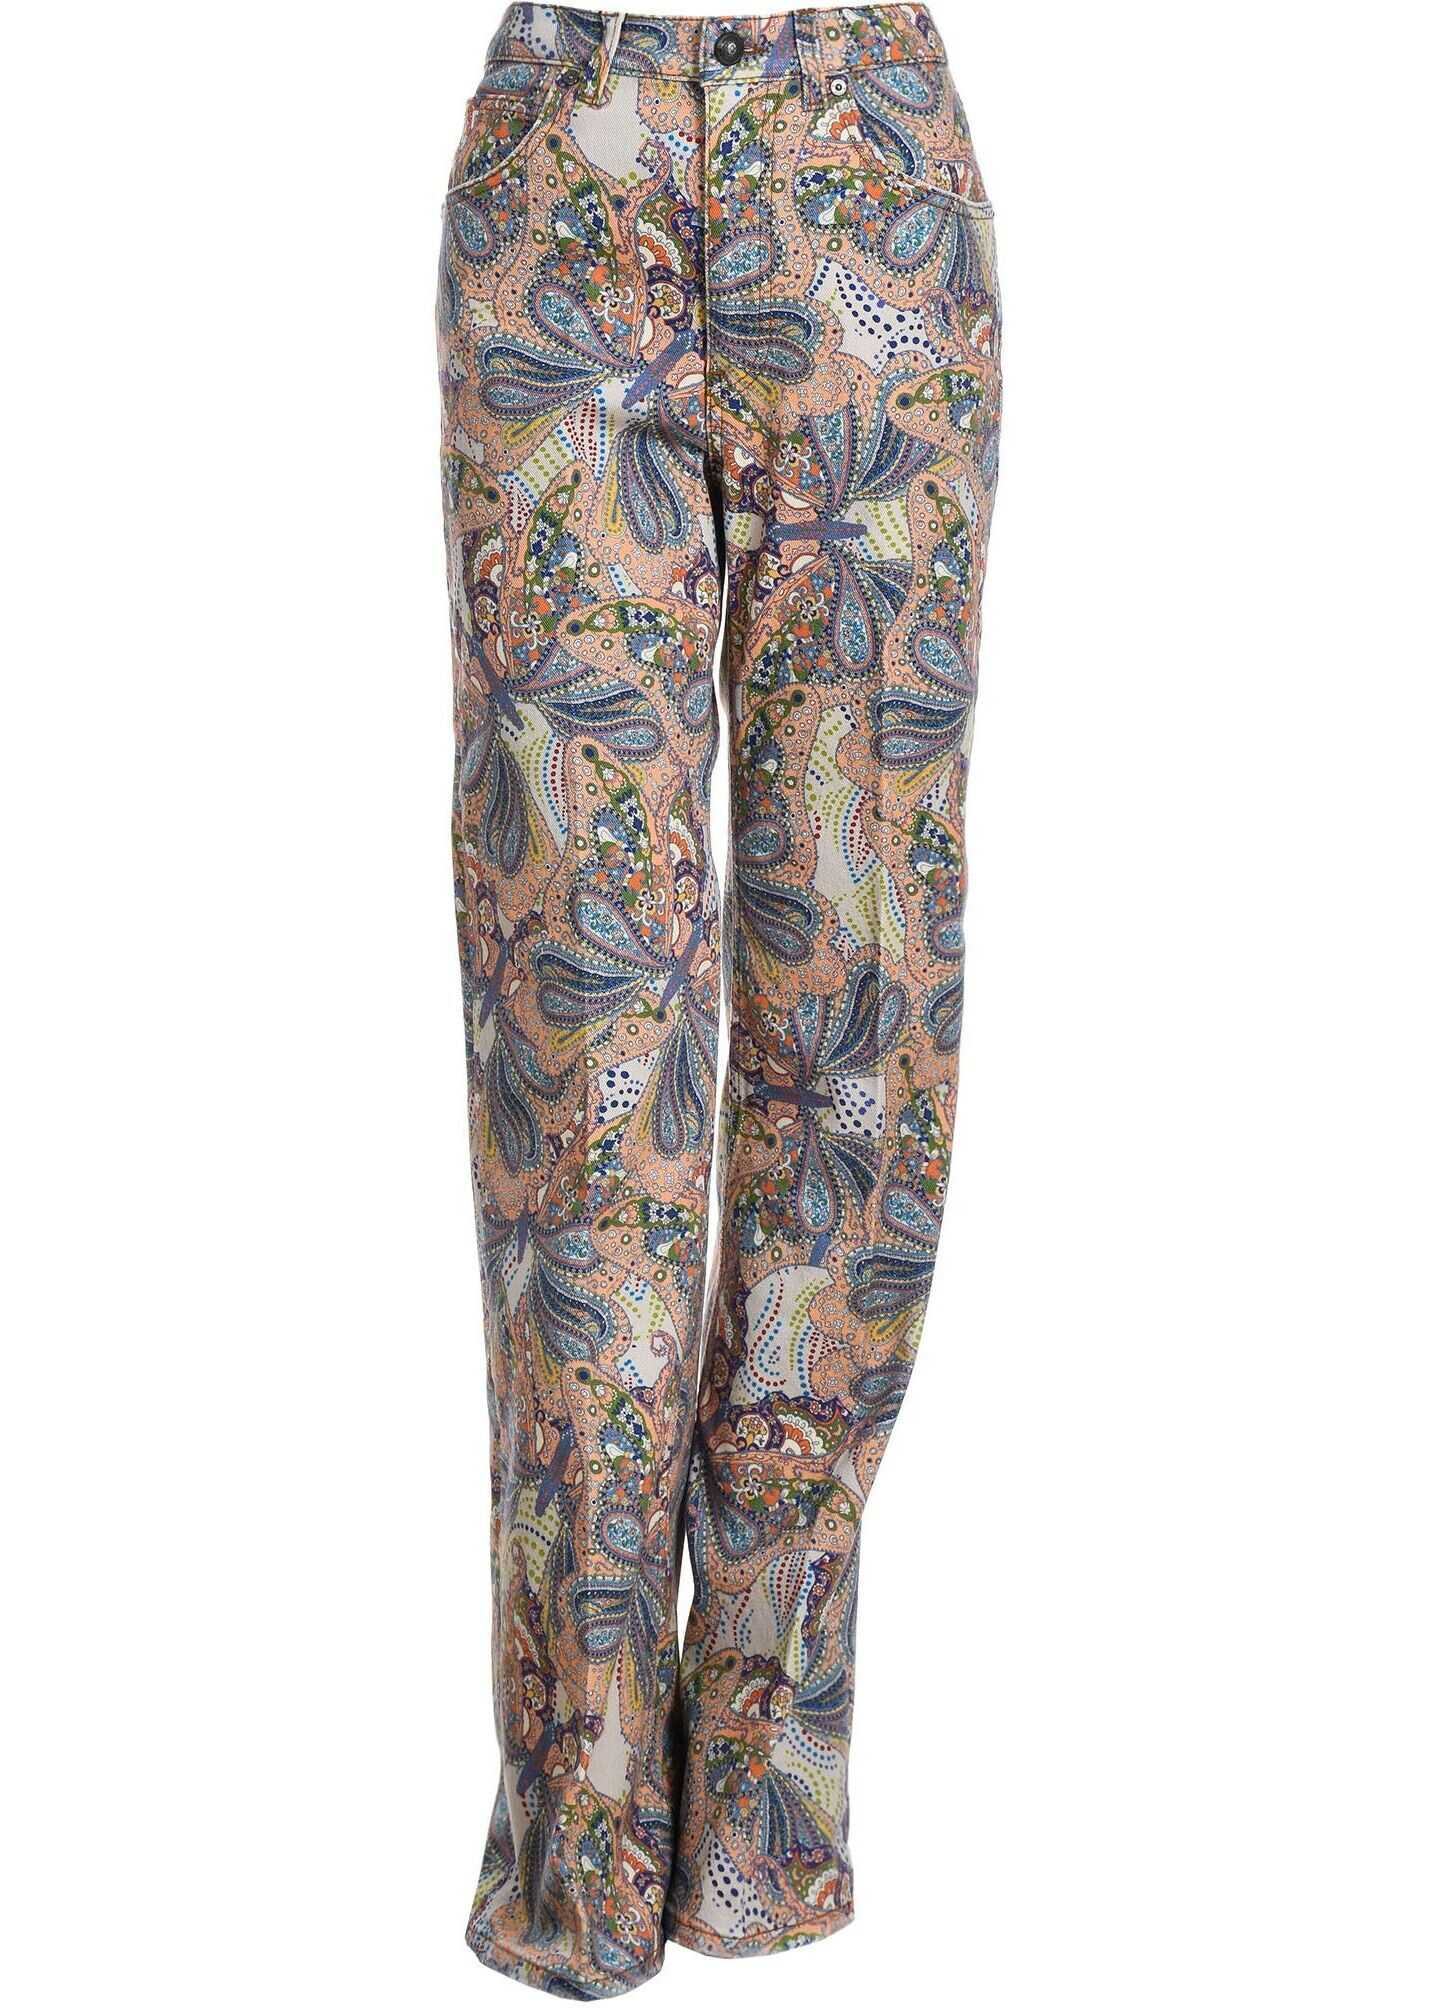 ETRO Cotton Jeans PINK